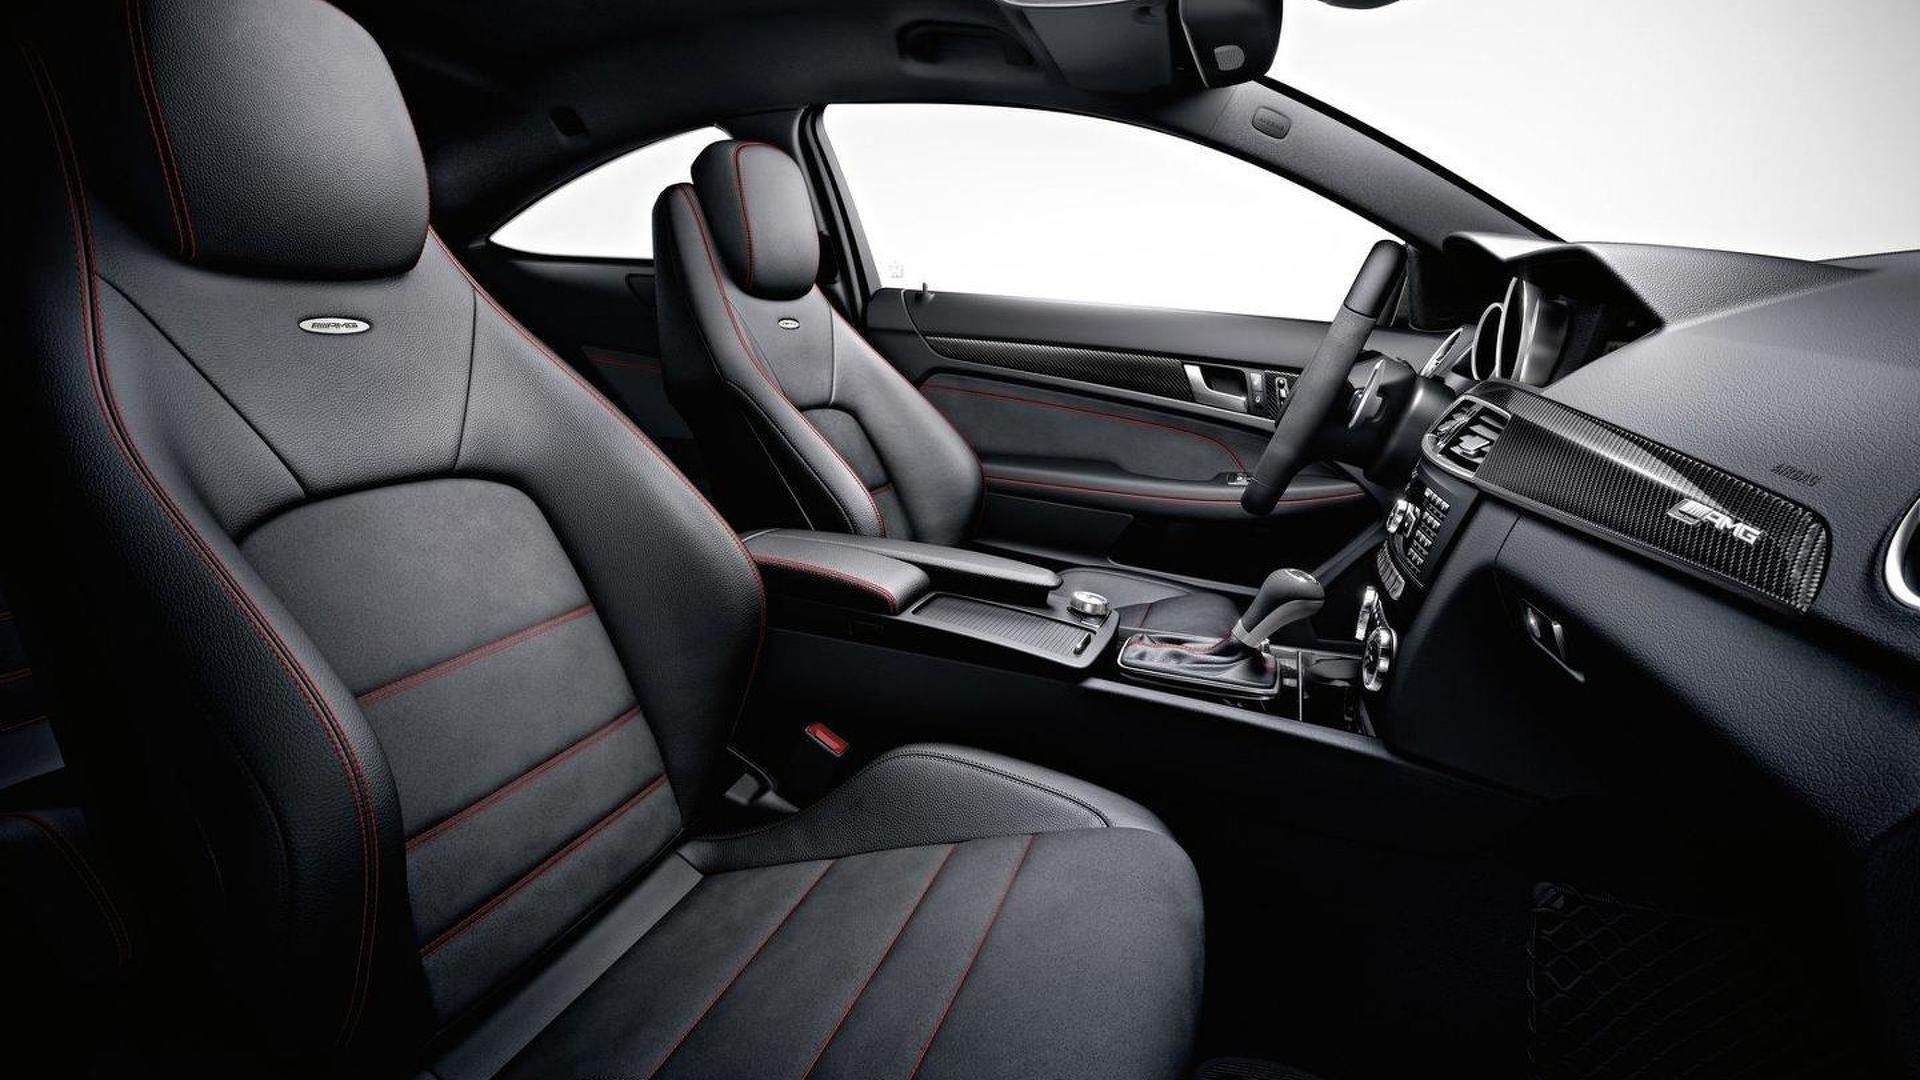 Mercedes Benz C63 AMG салон фото